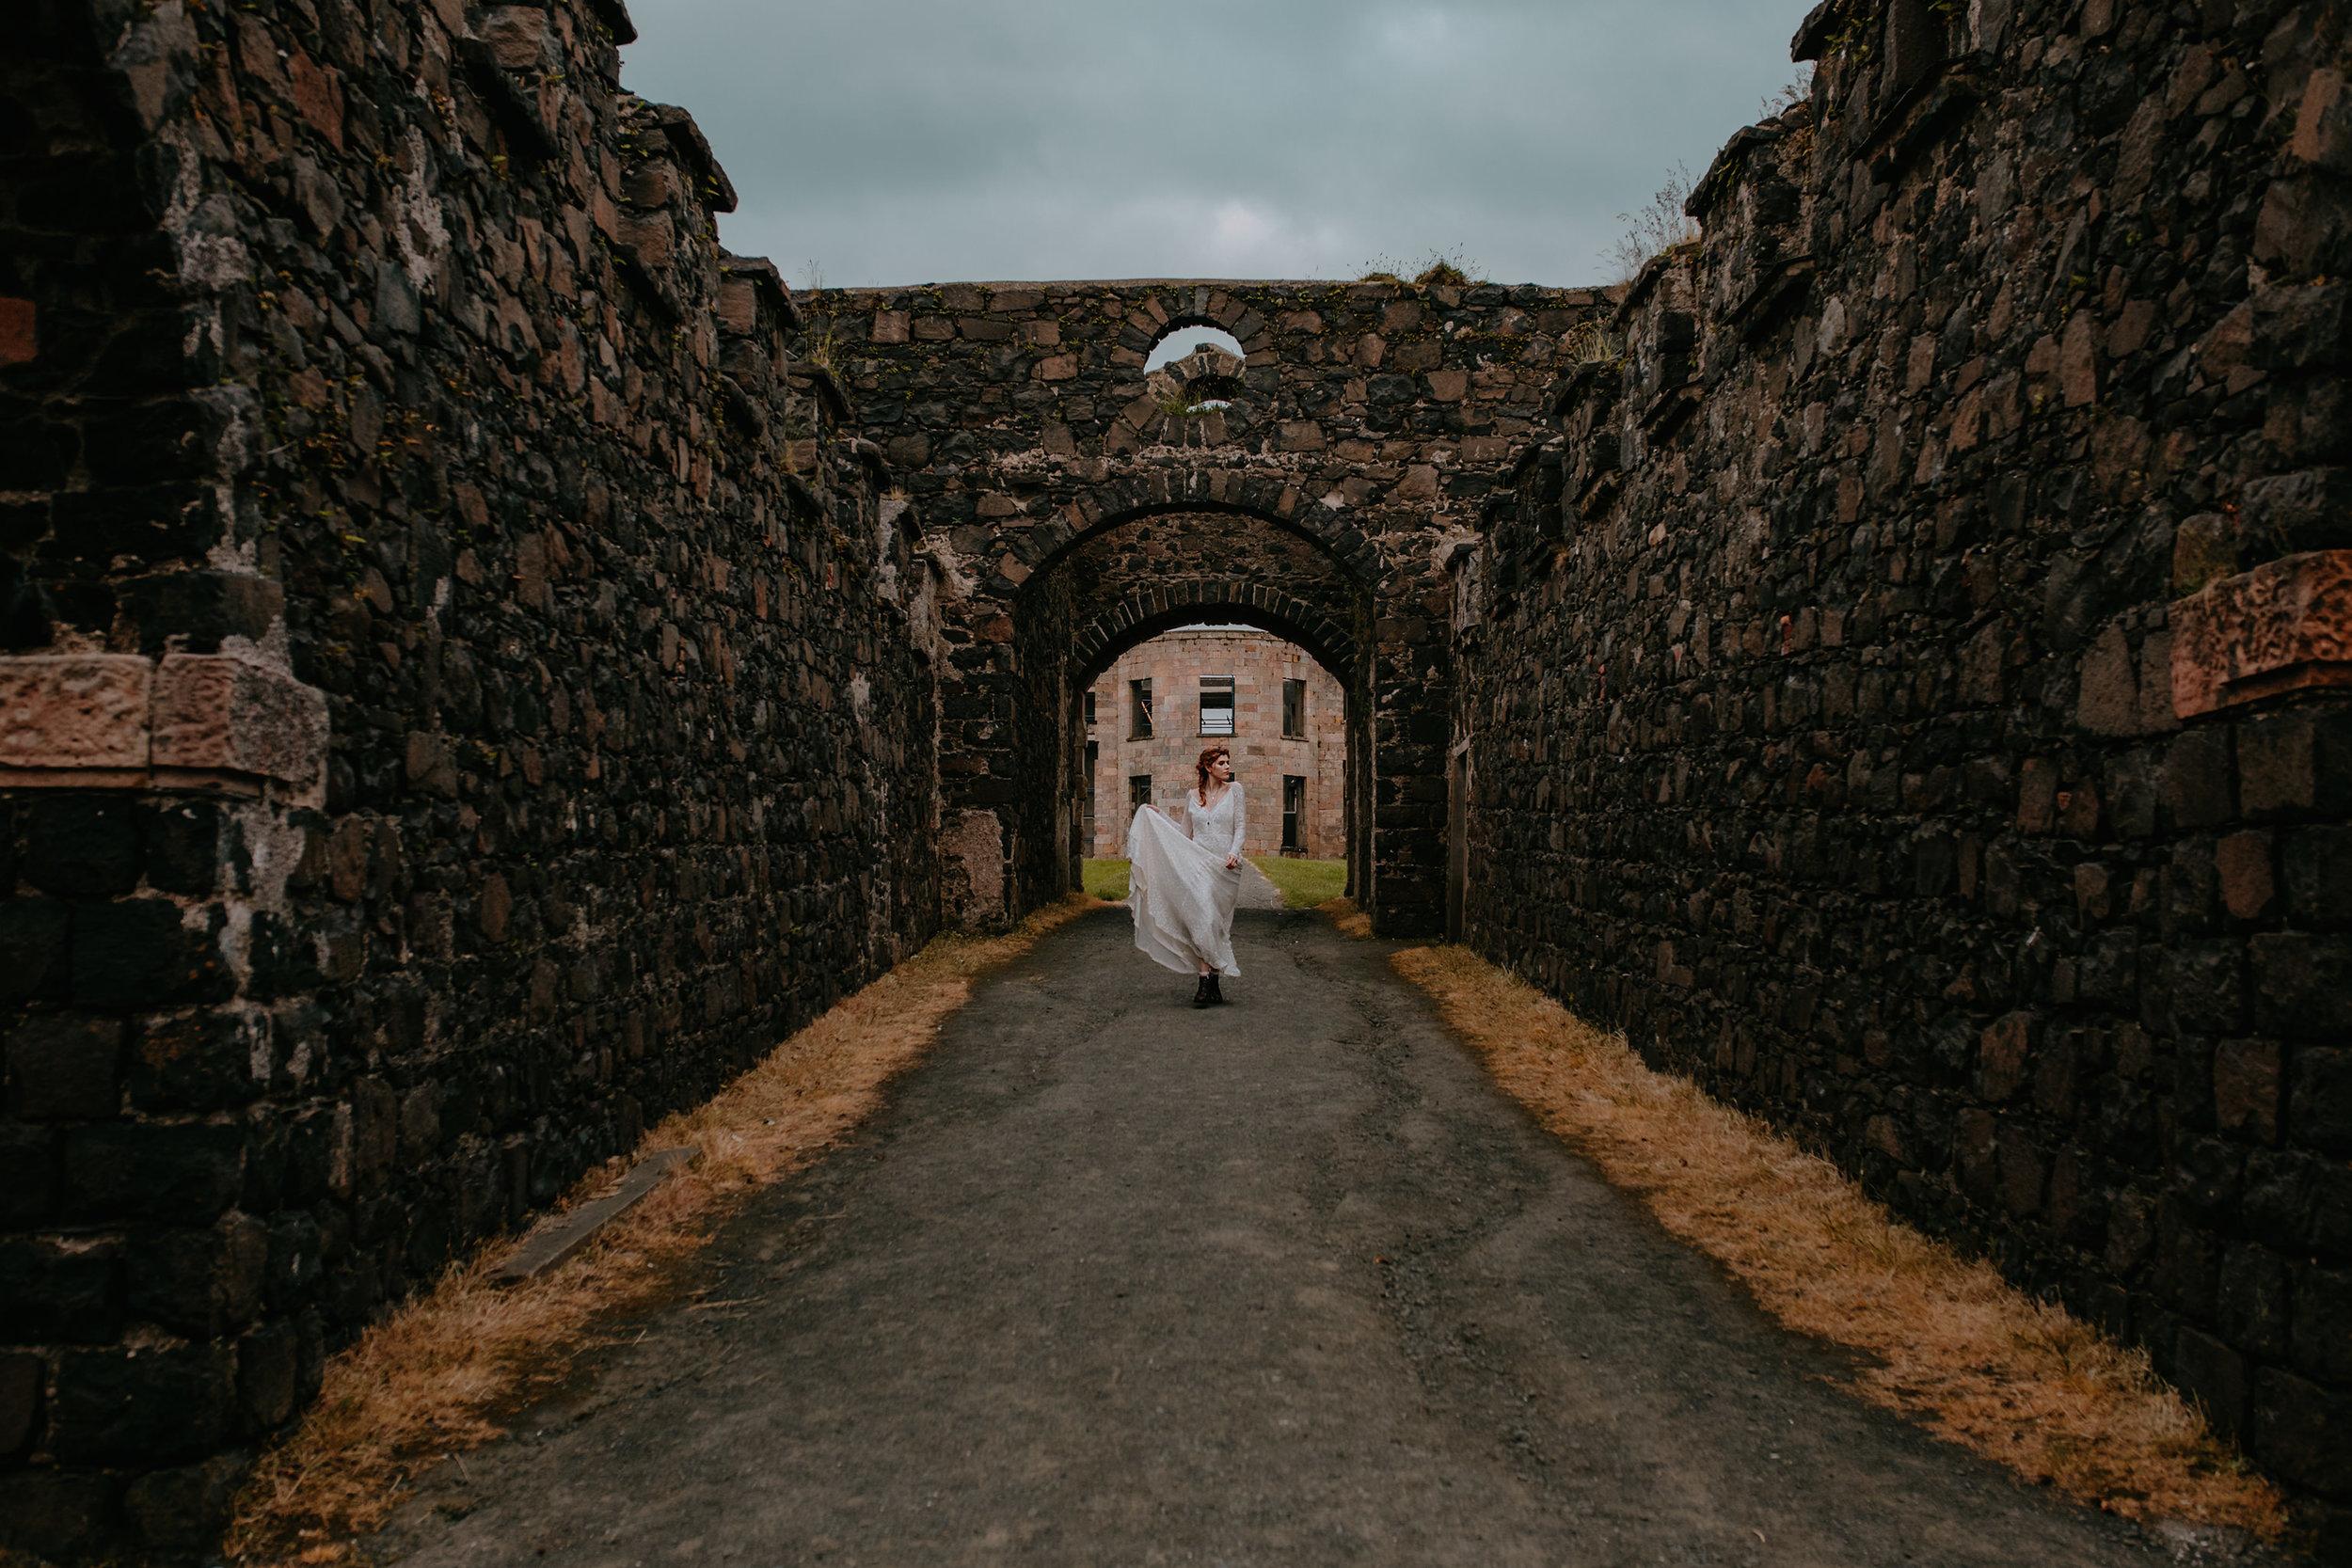 mussenden-temple-wedding-adventure-photographer-northern-ireland.jpg